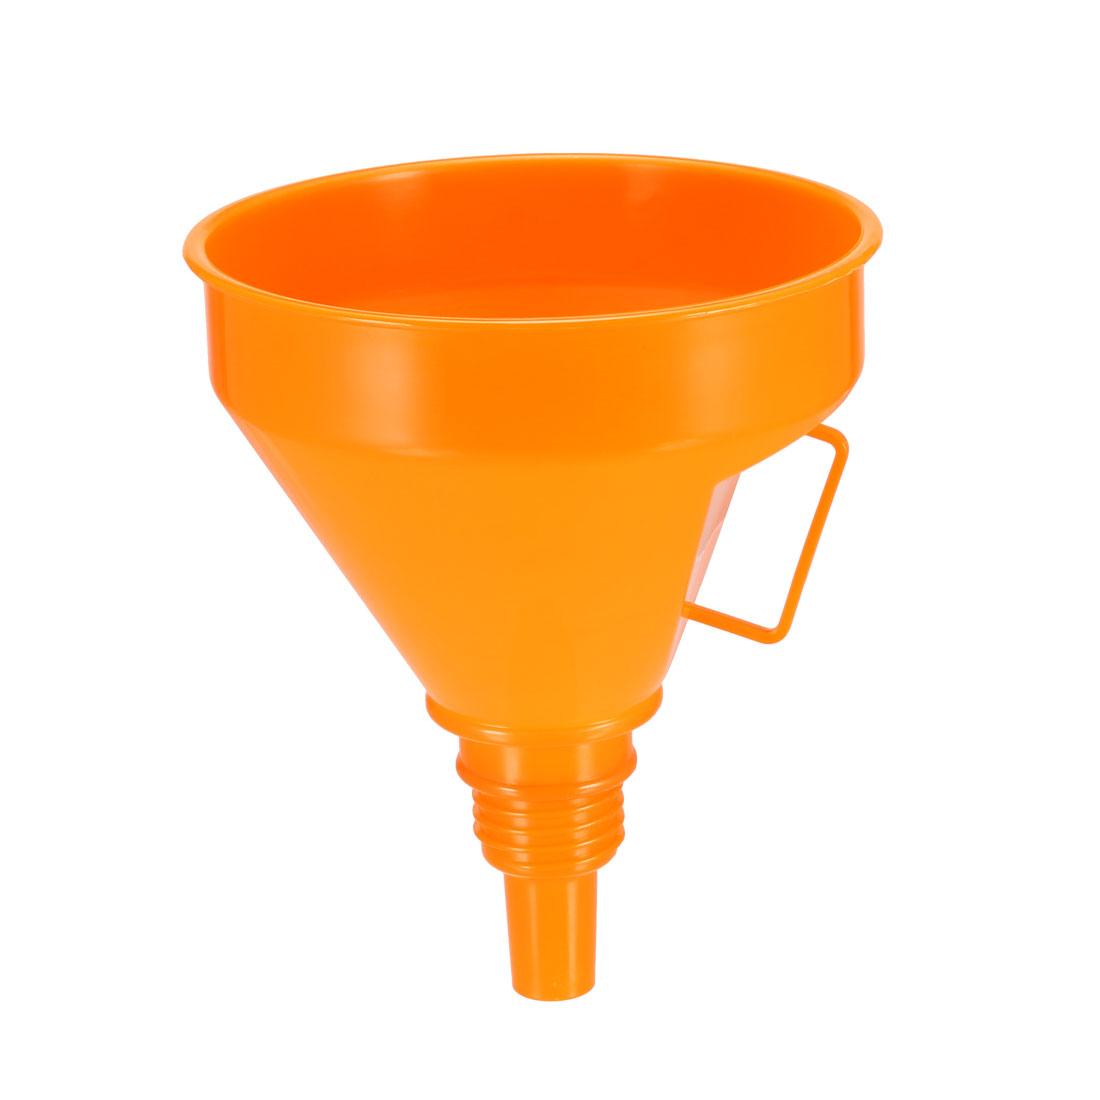 Orange Filter Funnel 6 inch Plastic Feul Funnel for Petrol Engine Oil Water Fuel